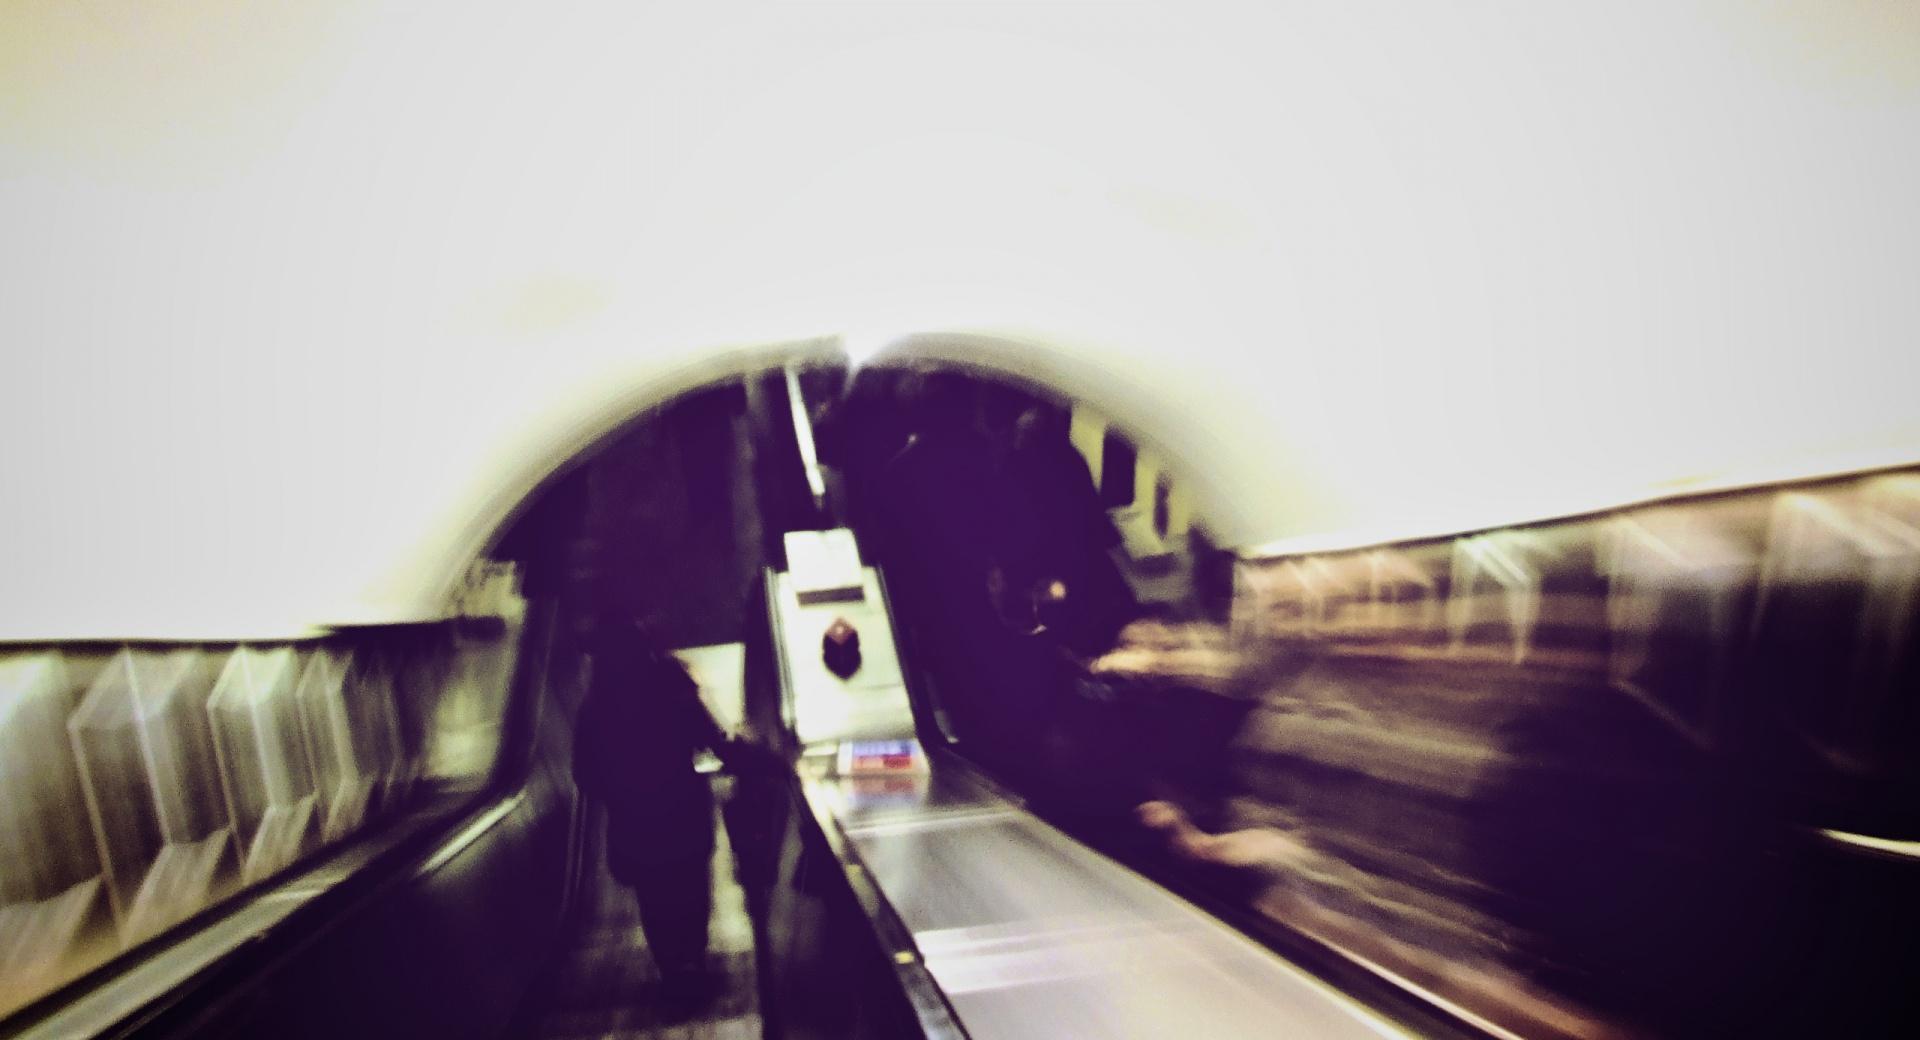 Subway Escalator wallpapers HD quality